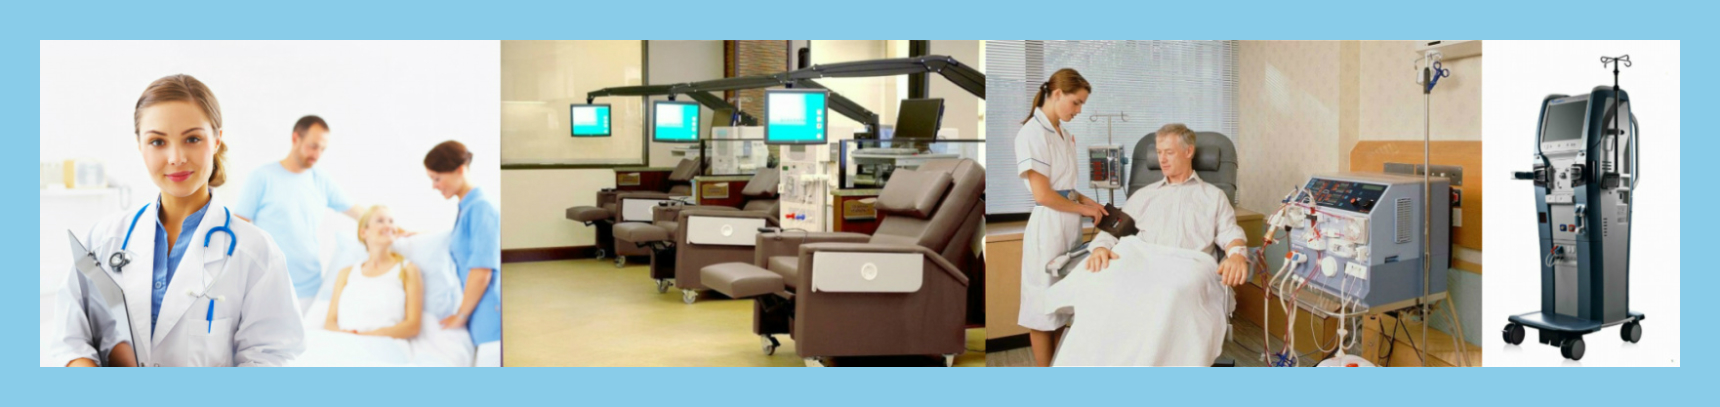 dialysis technician banner test dialysis technician central